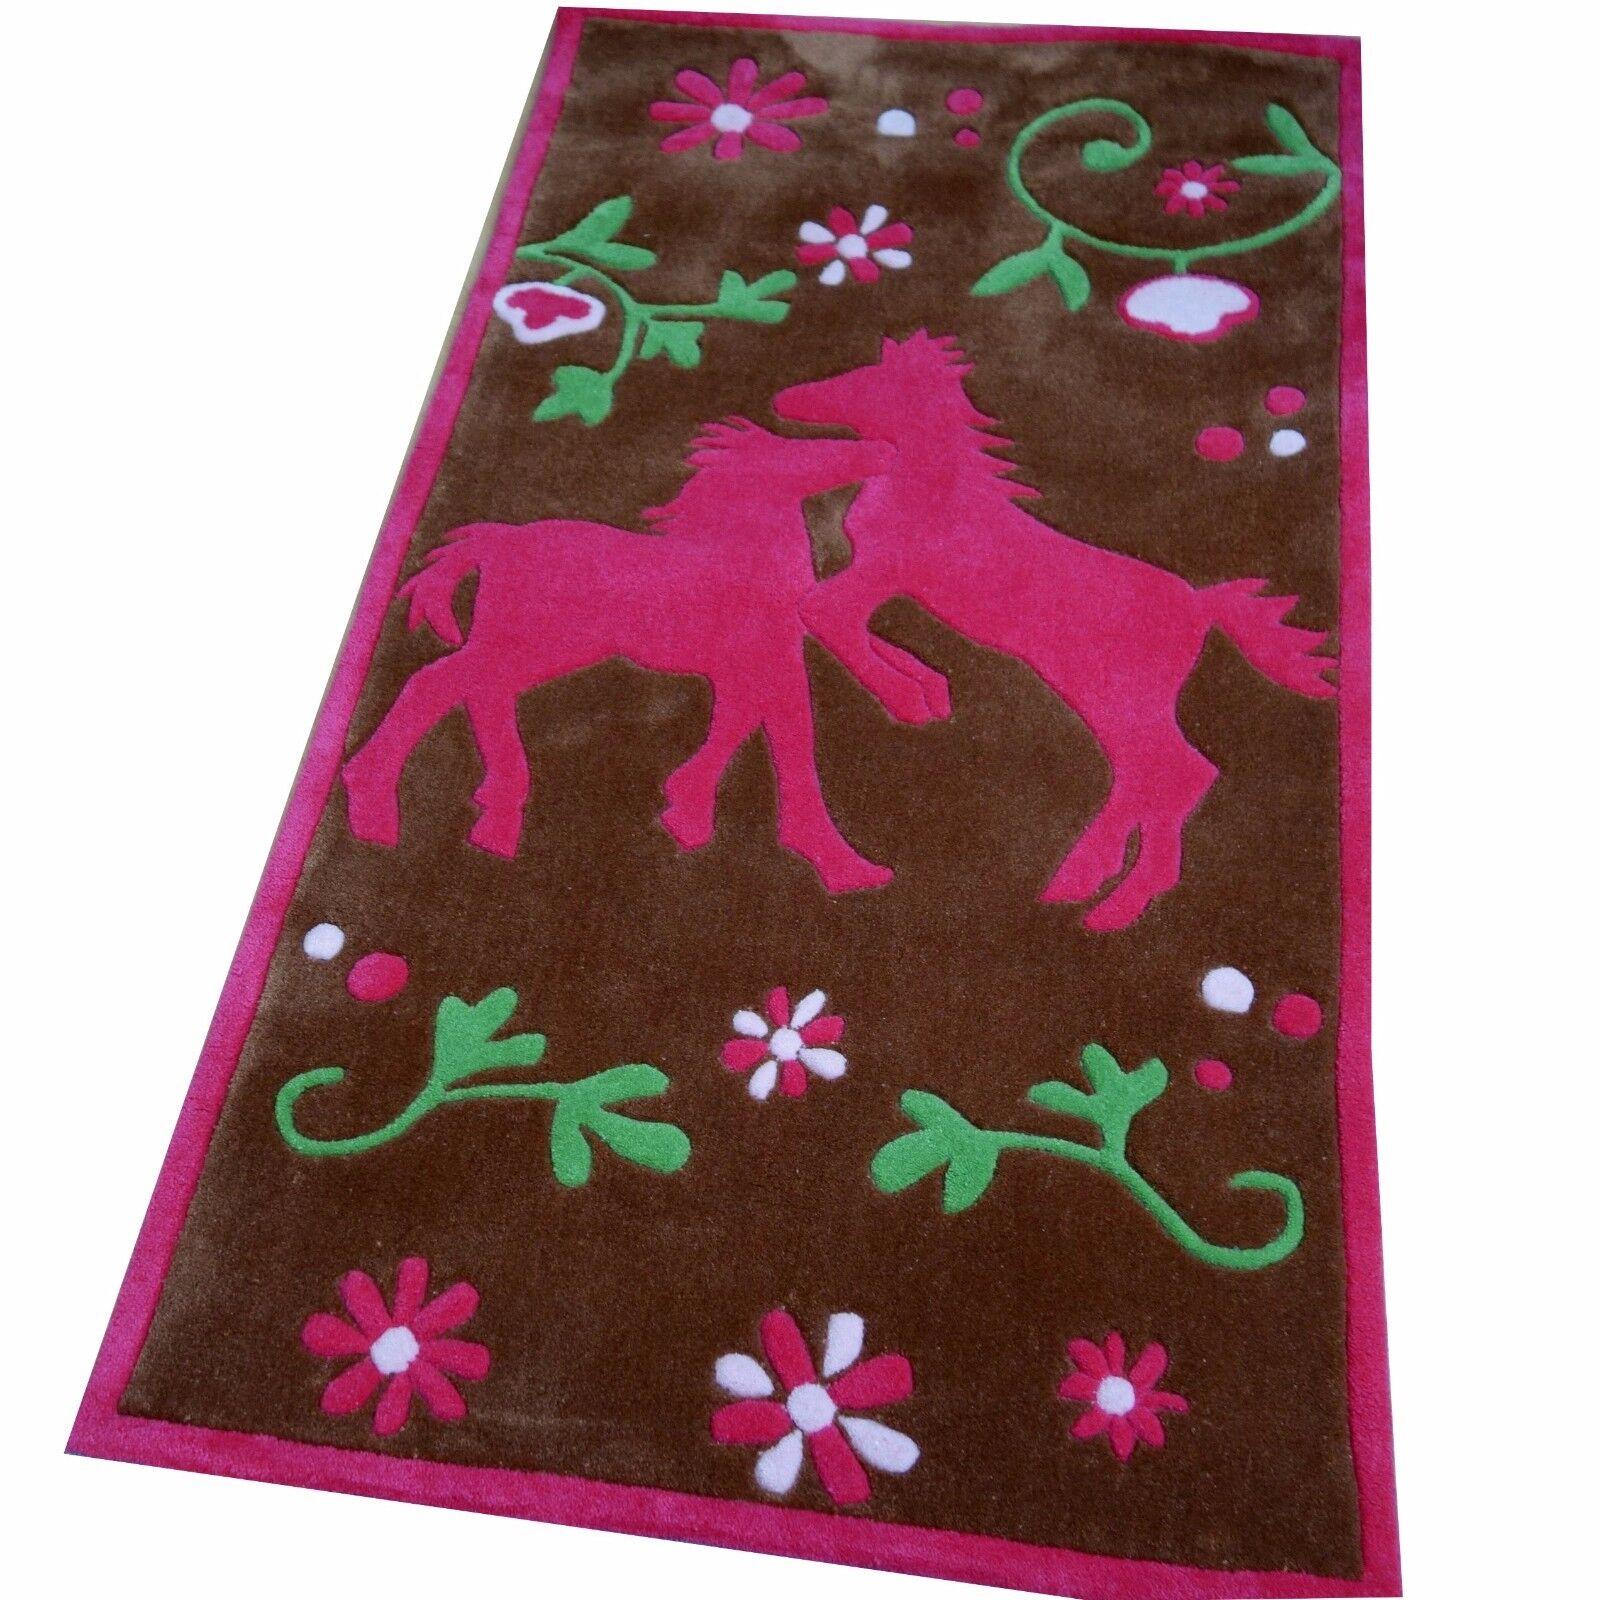 Tapis Chevaux Amis 80x150 cm marron rose Handtuft kinderpielteppich